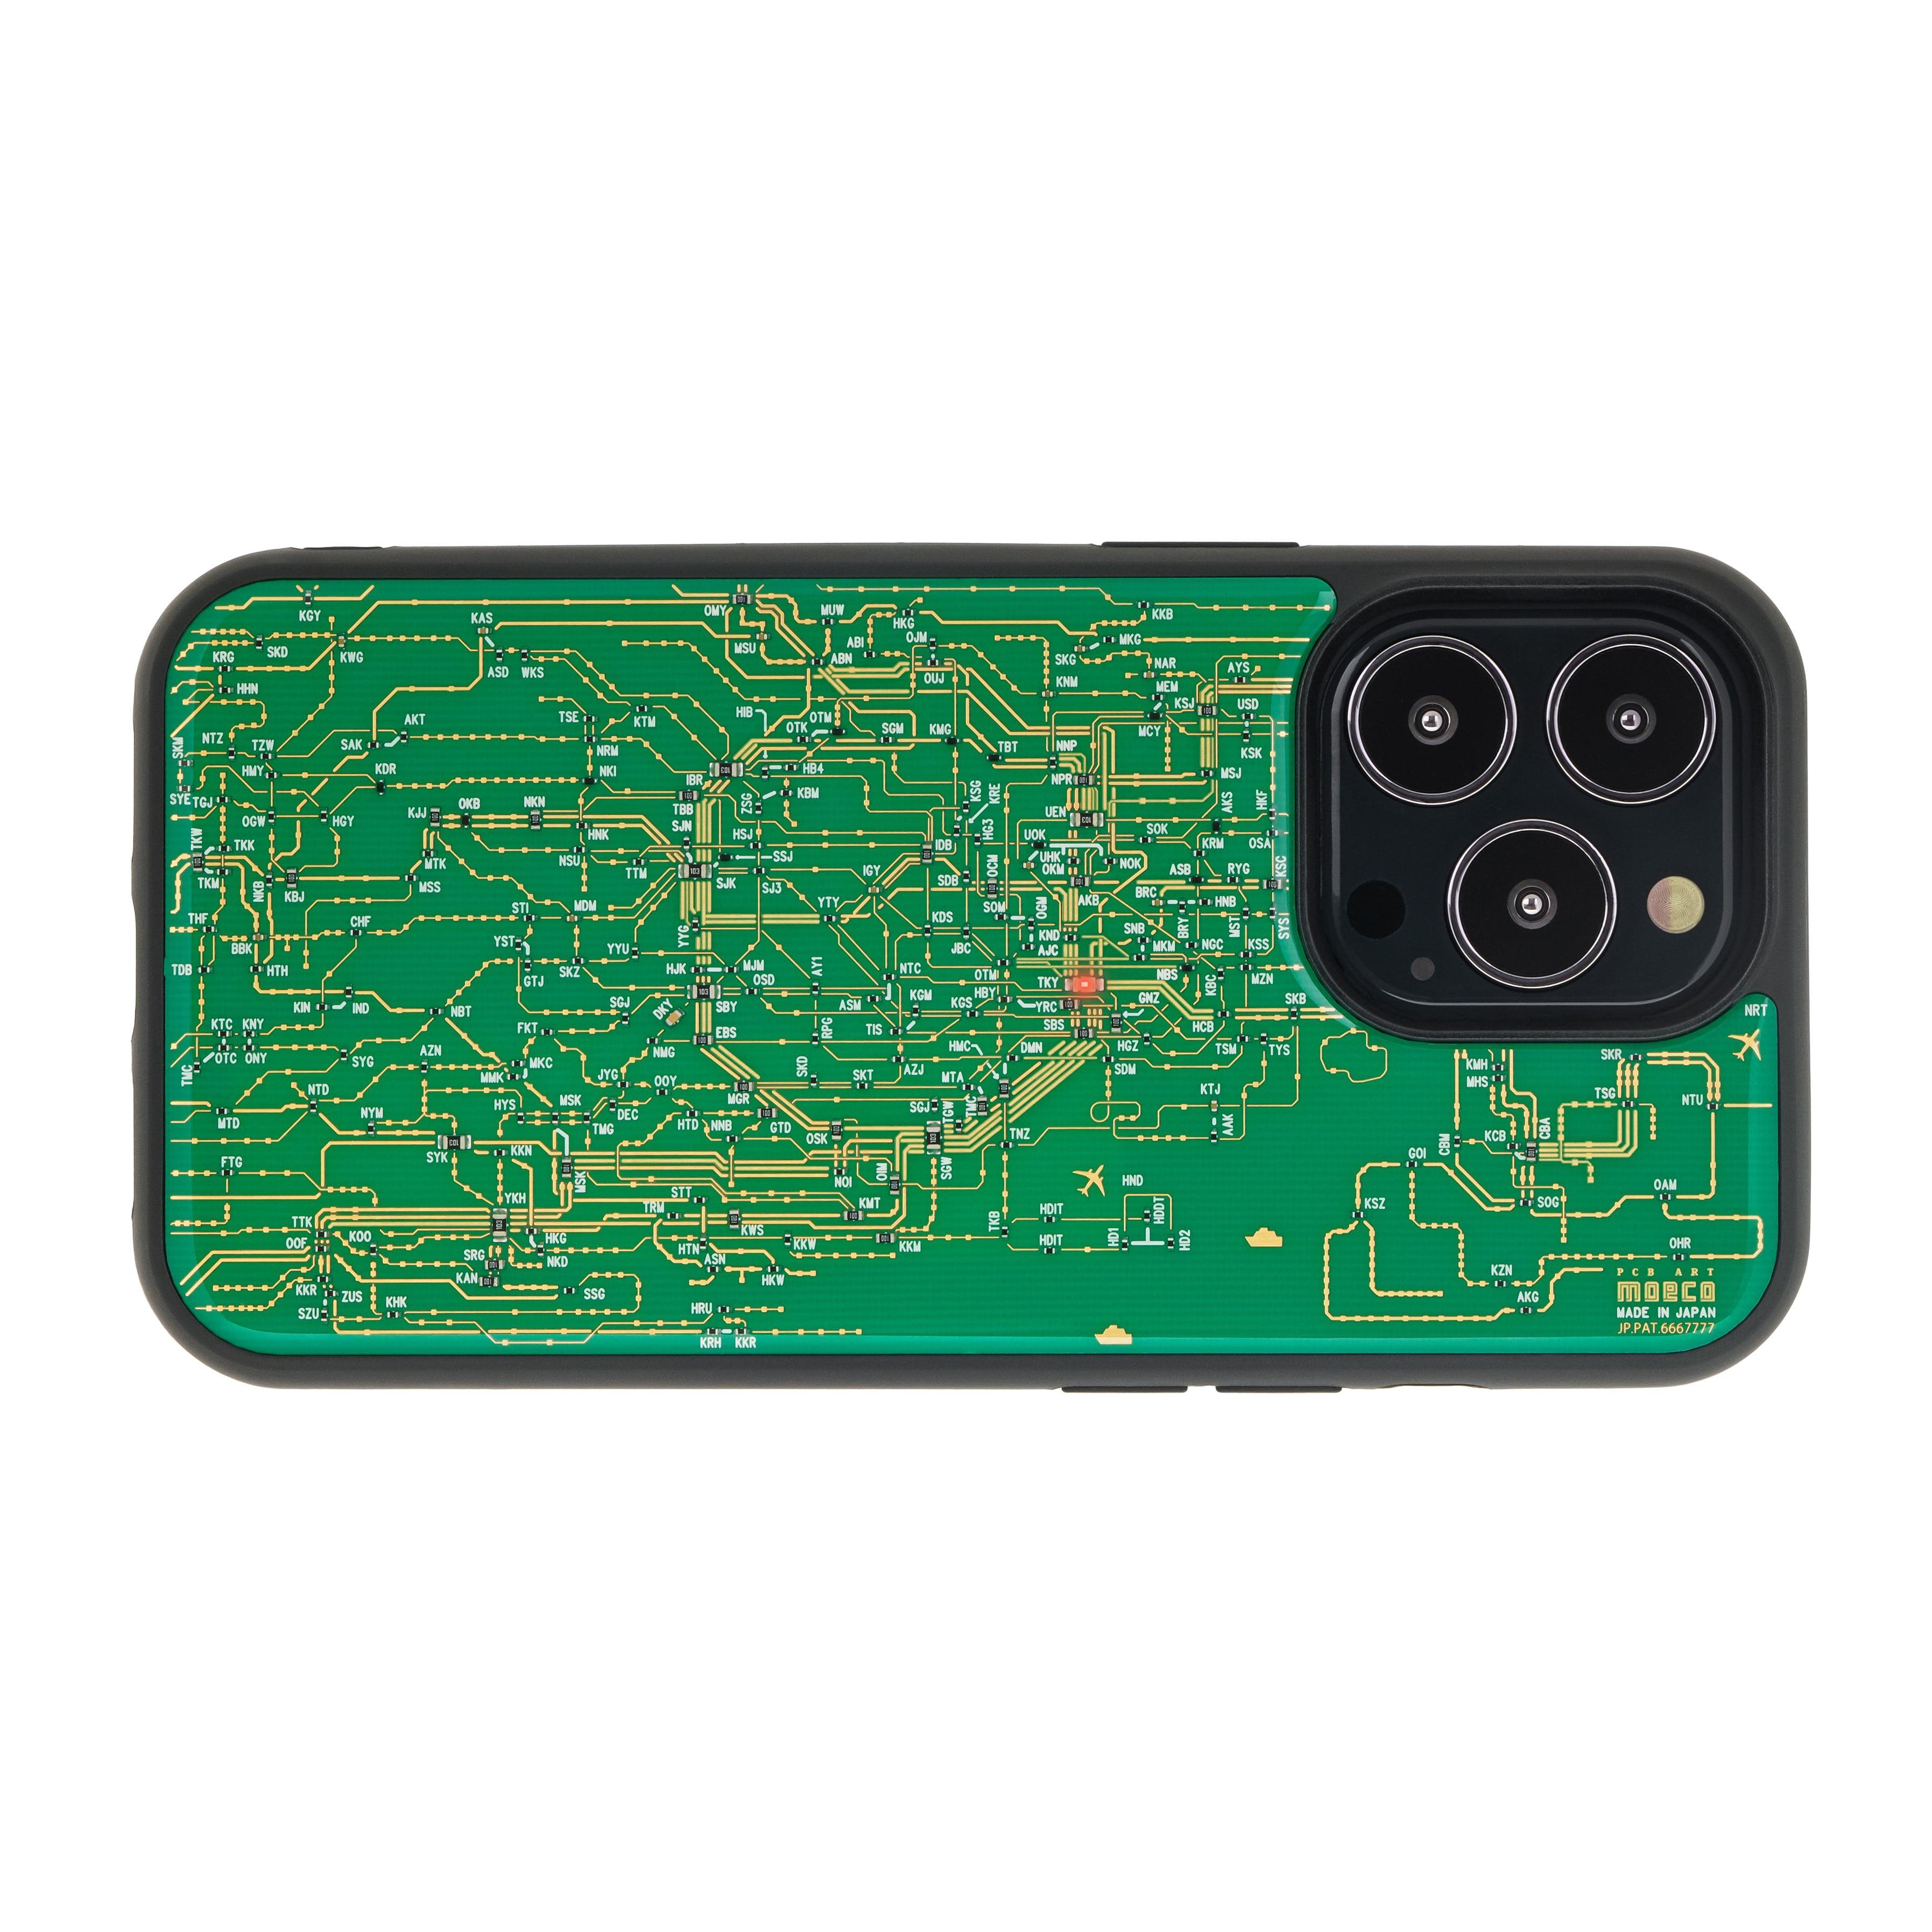 FLASH 東京回路線図 iPhone 13 Pro ケース 緑【東京回路線図A5クリアファイルをプレゼント】